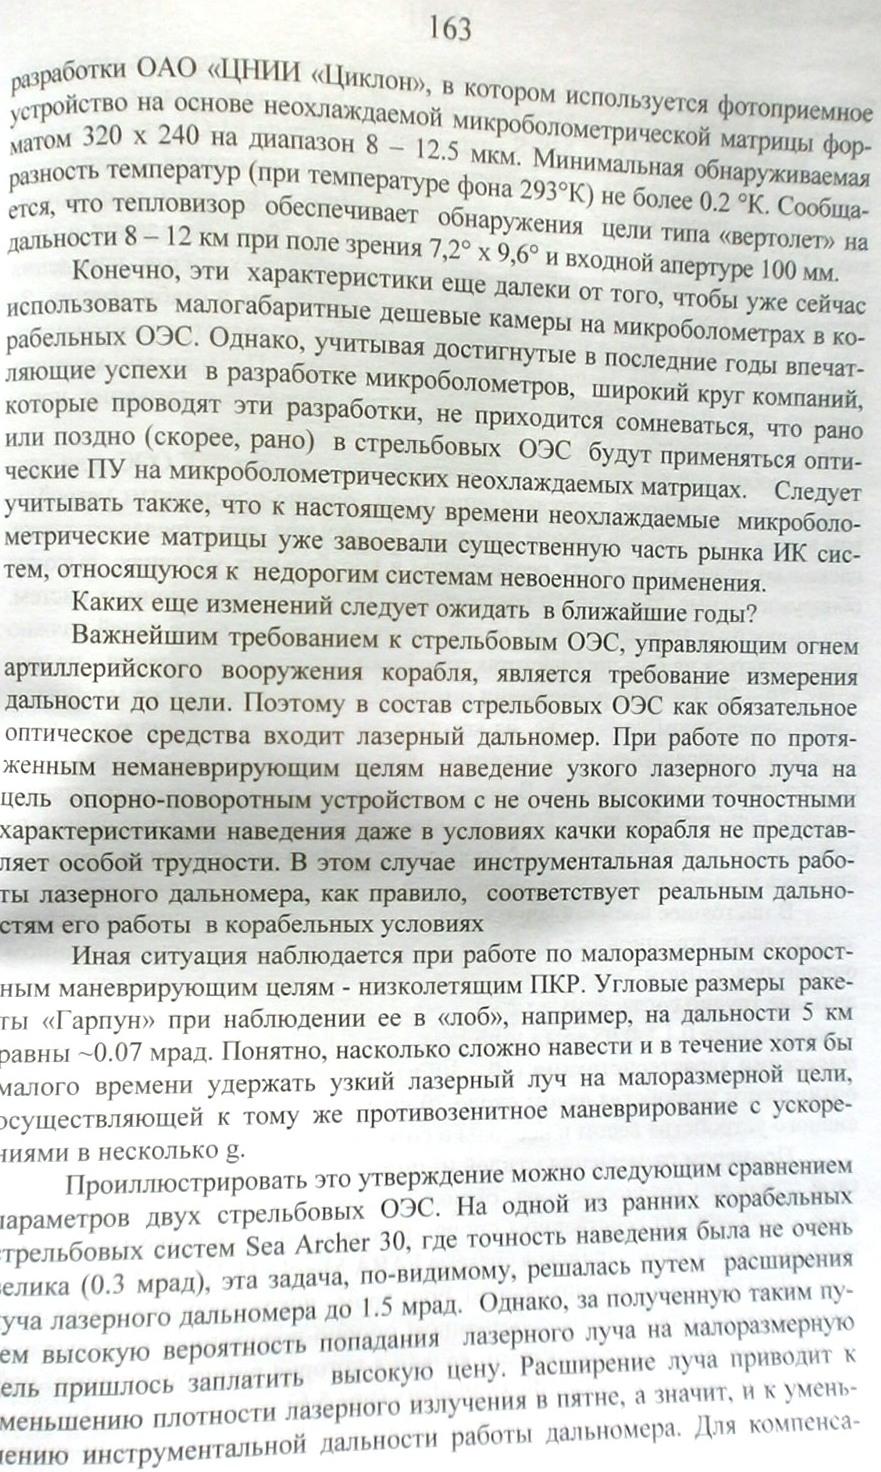 http://sh.uploads.ru/l1qCb.jpg